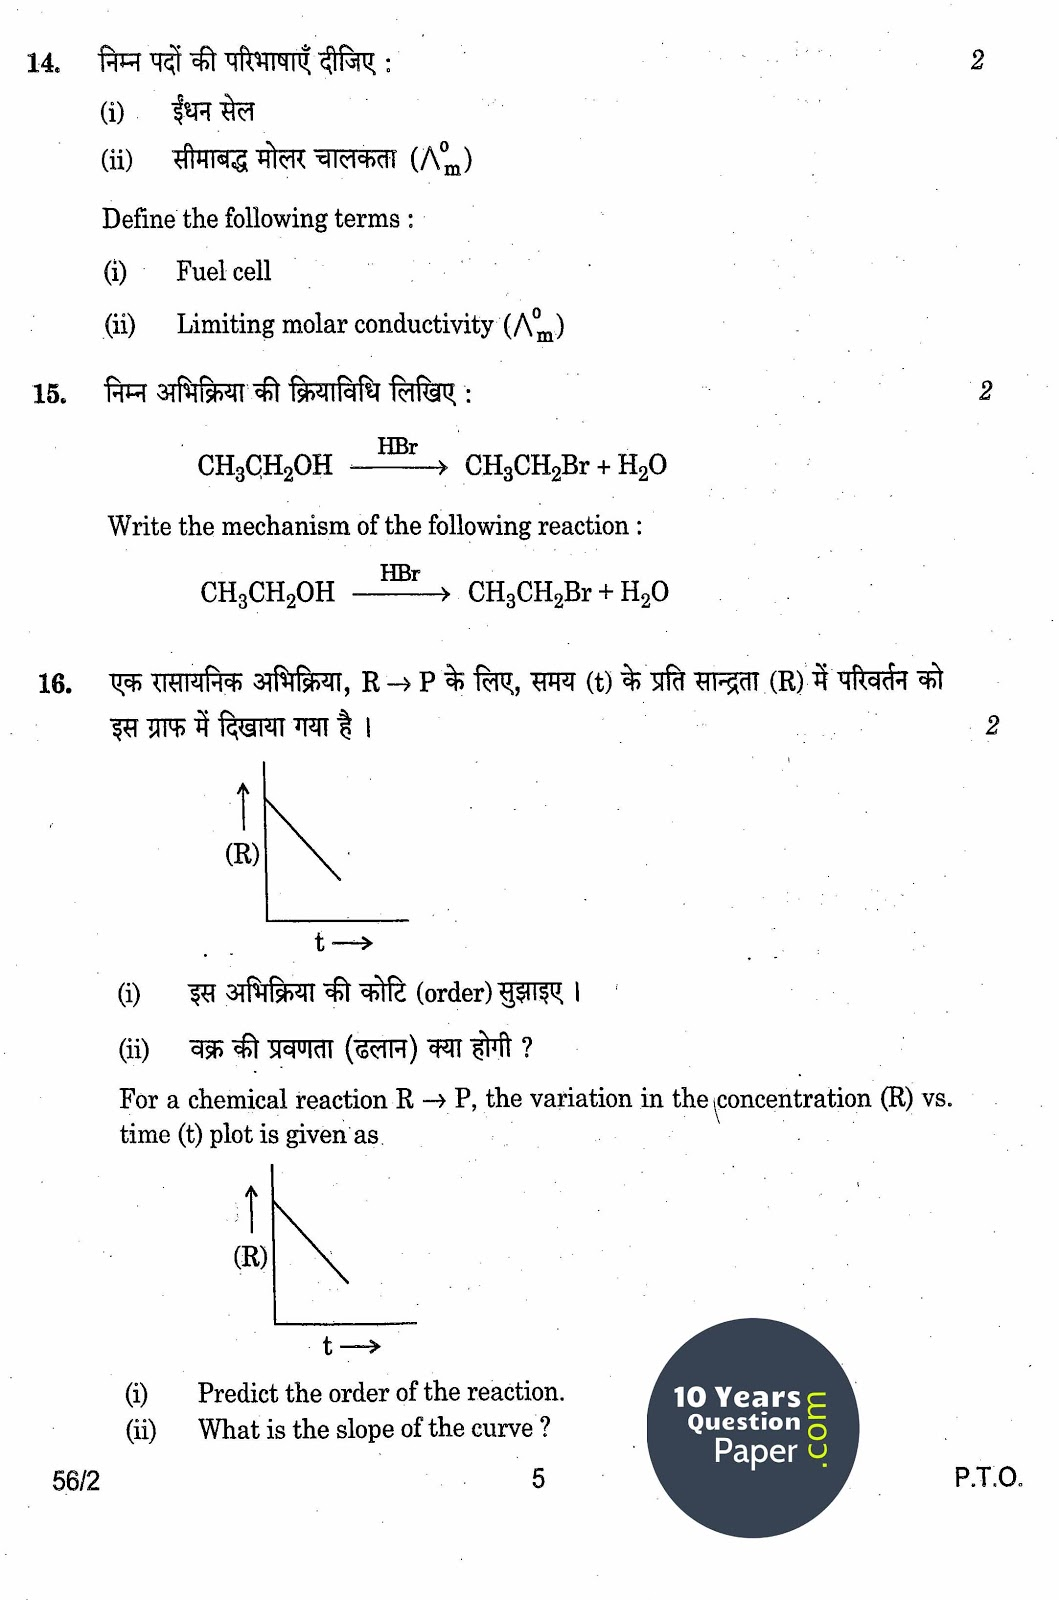 CBSE Class 12 Chemistry 2014 Question Paper